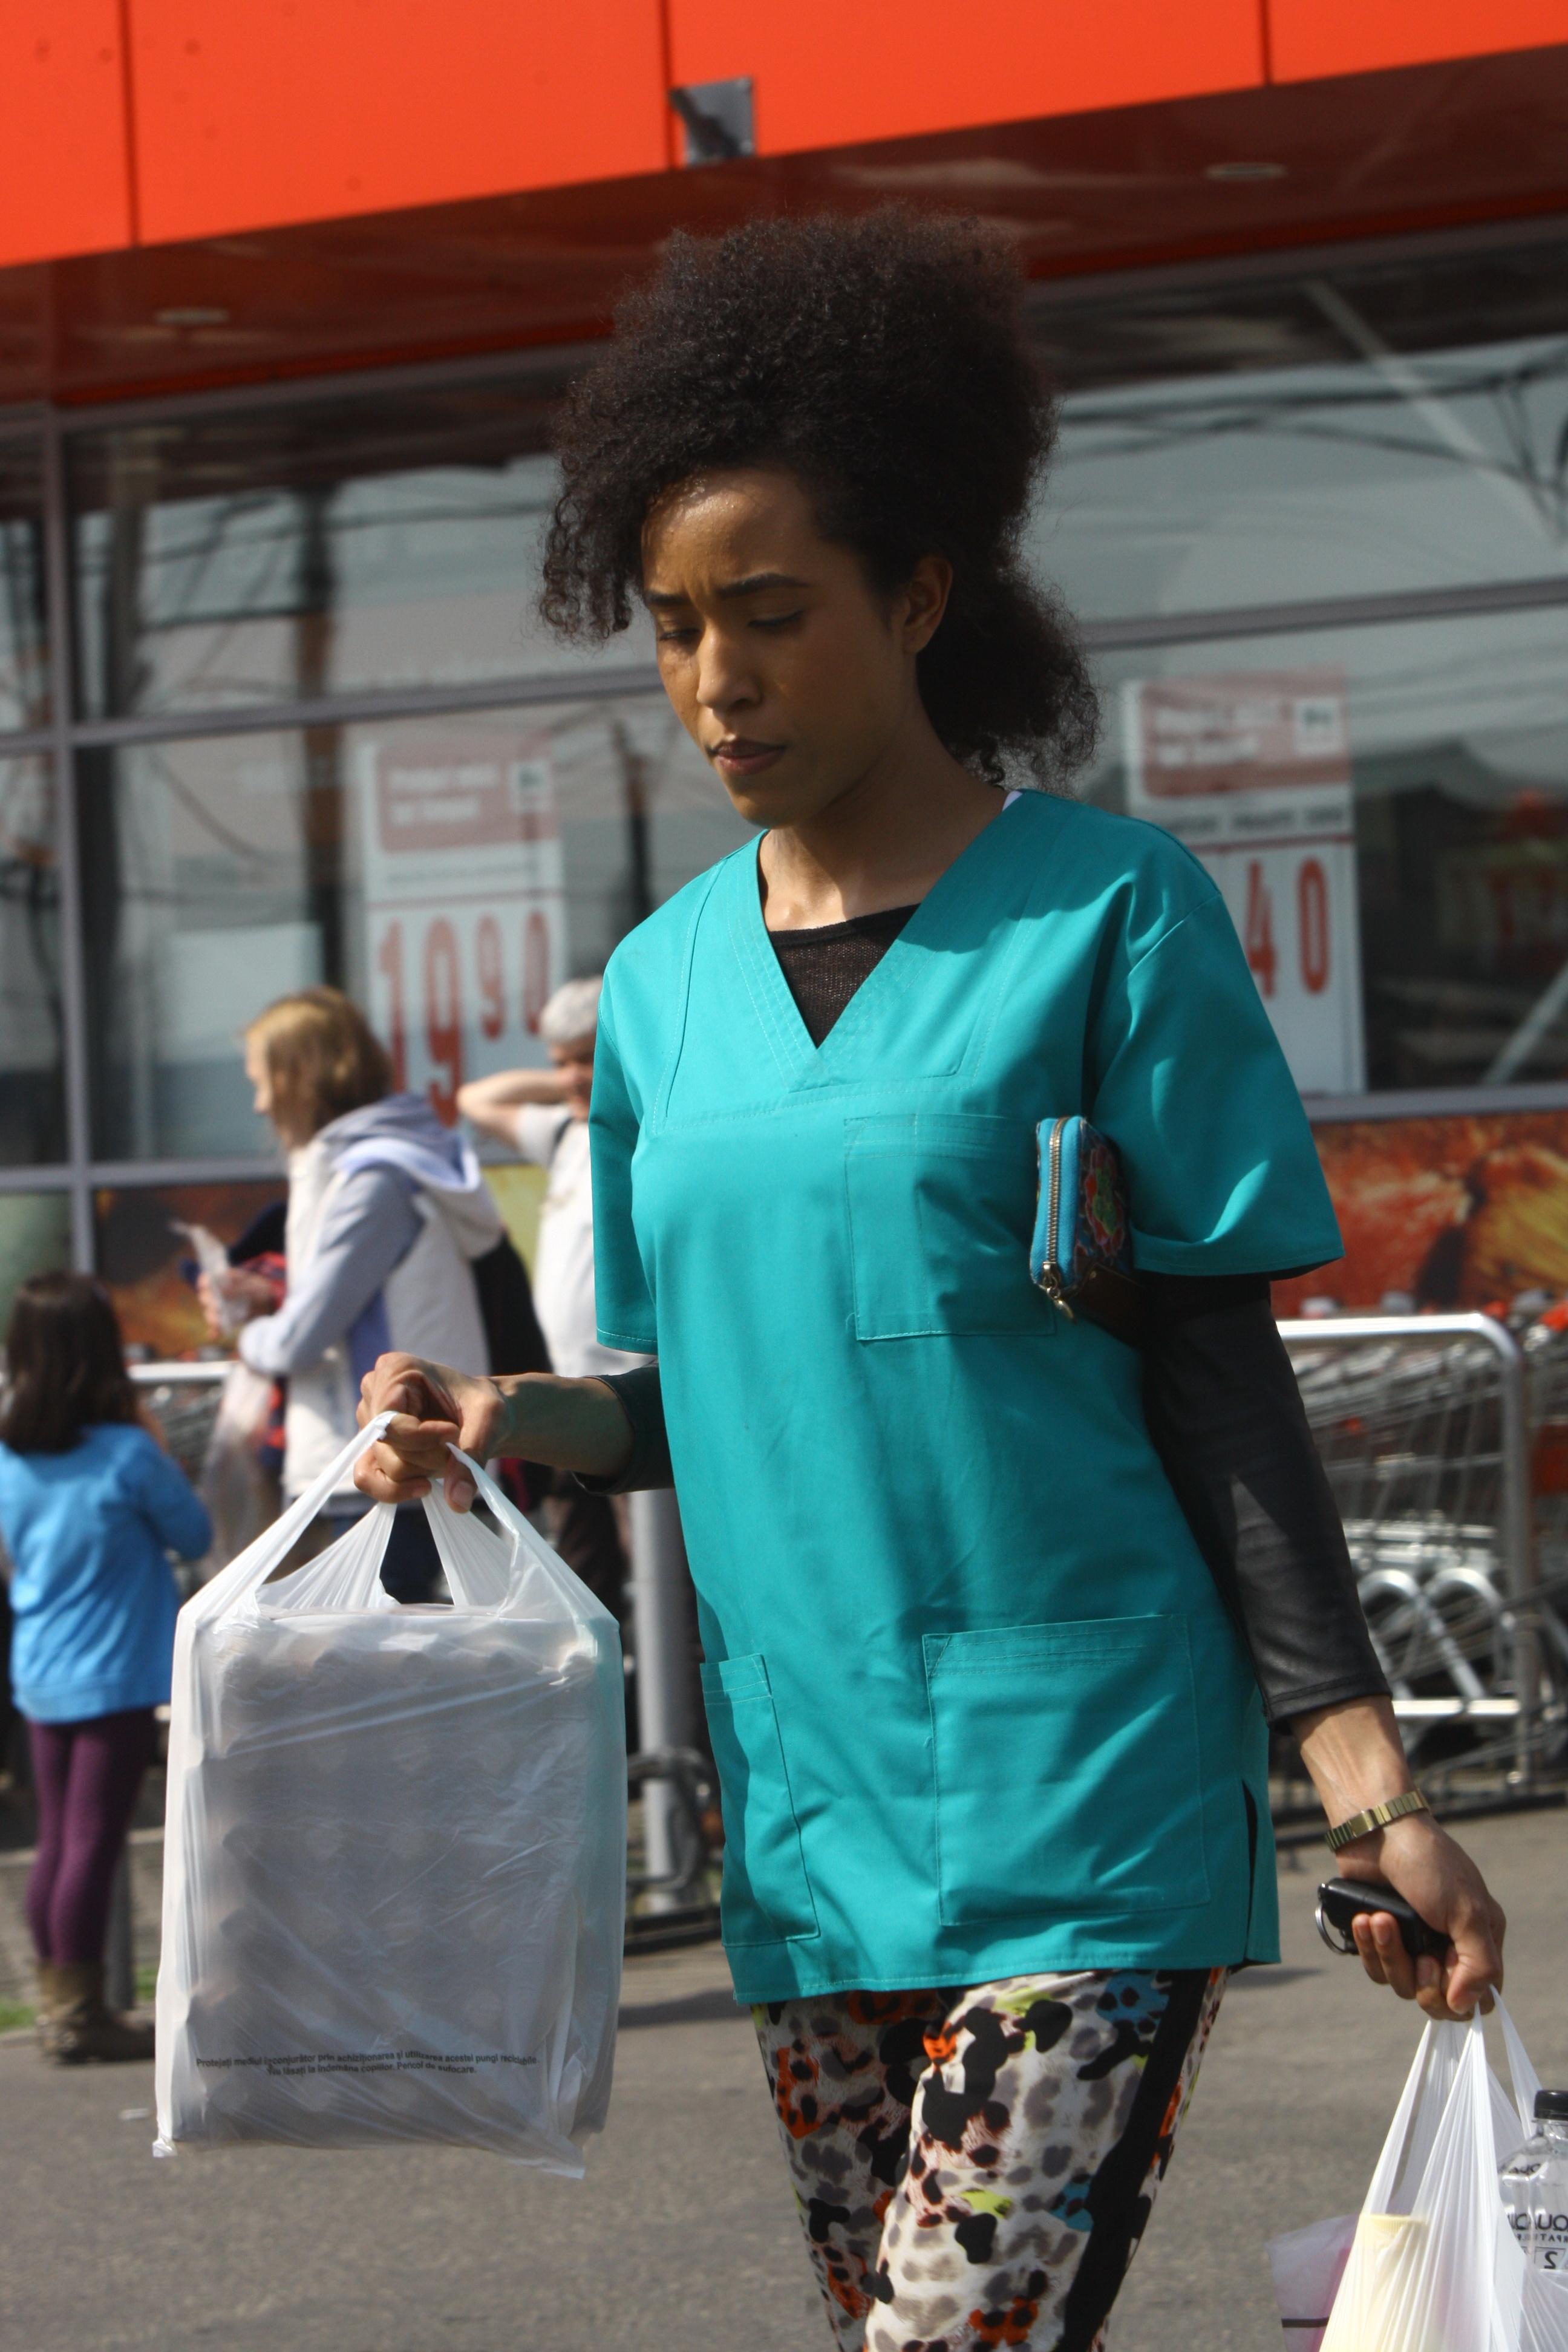 Intre doua consultatii, Ana Velea a iesit sa-si faca si cumparaturile